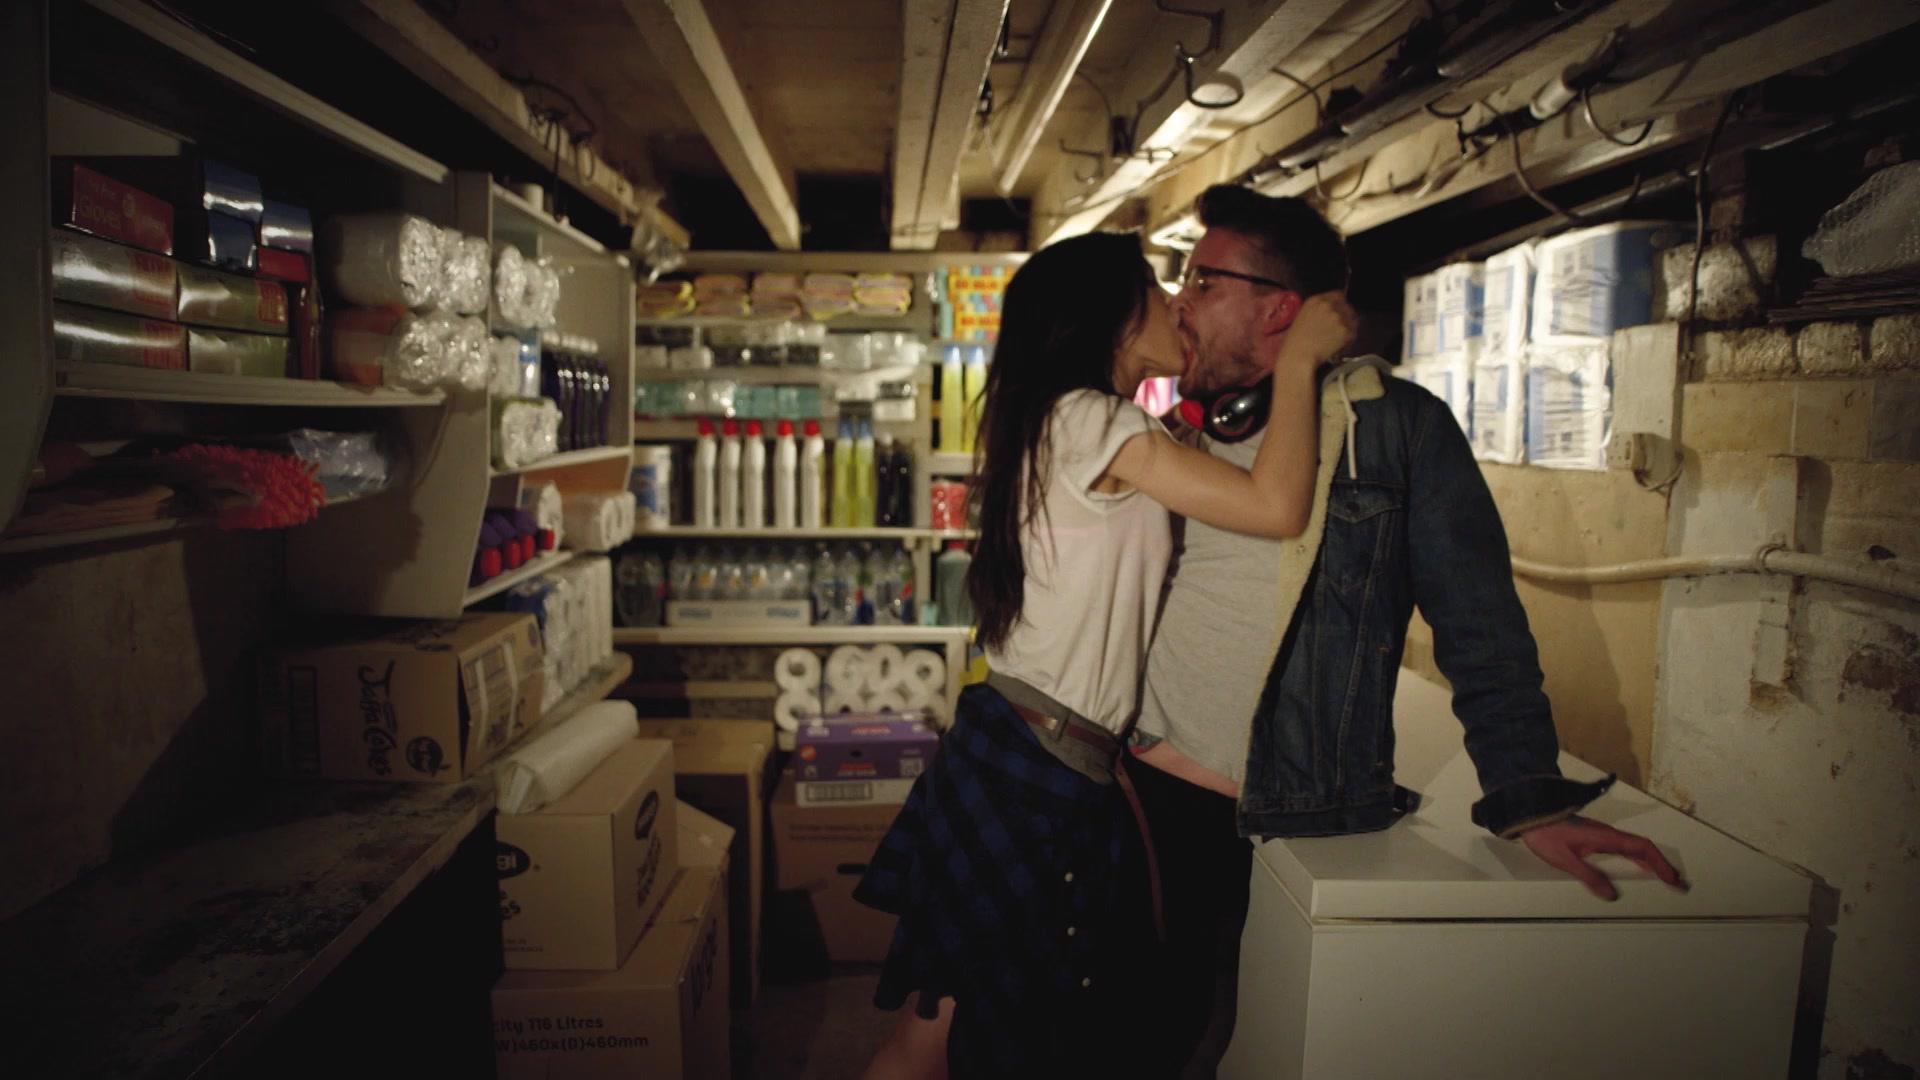 Playboy TV: XConfessions, Season 2 Ep. 5 23